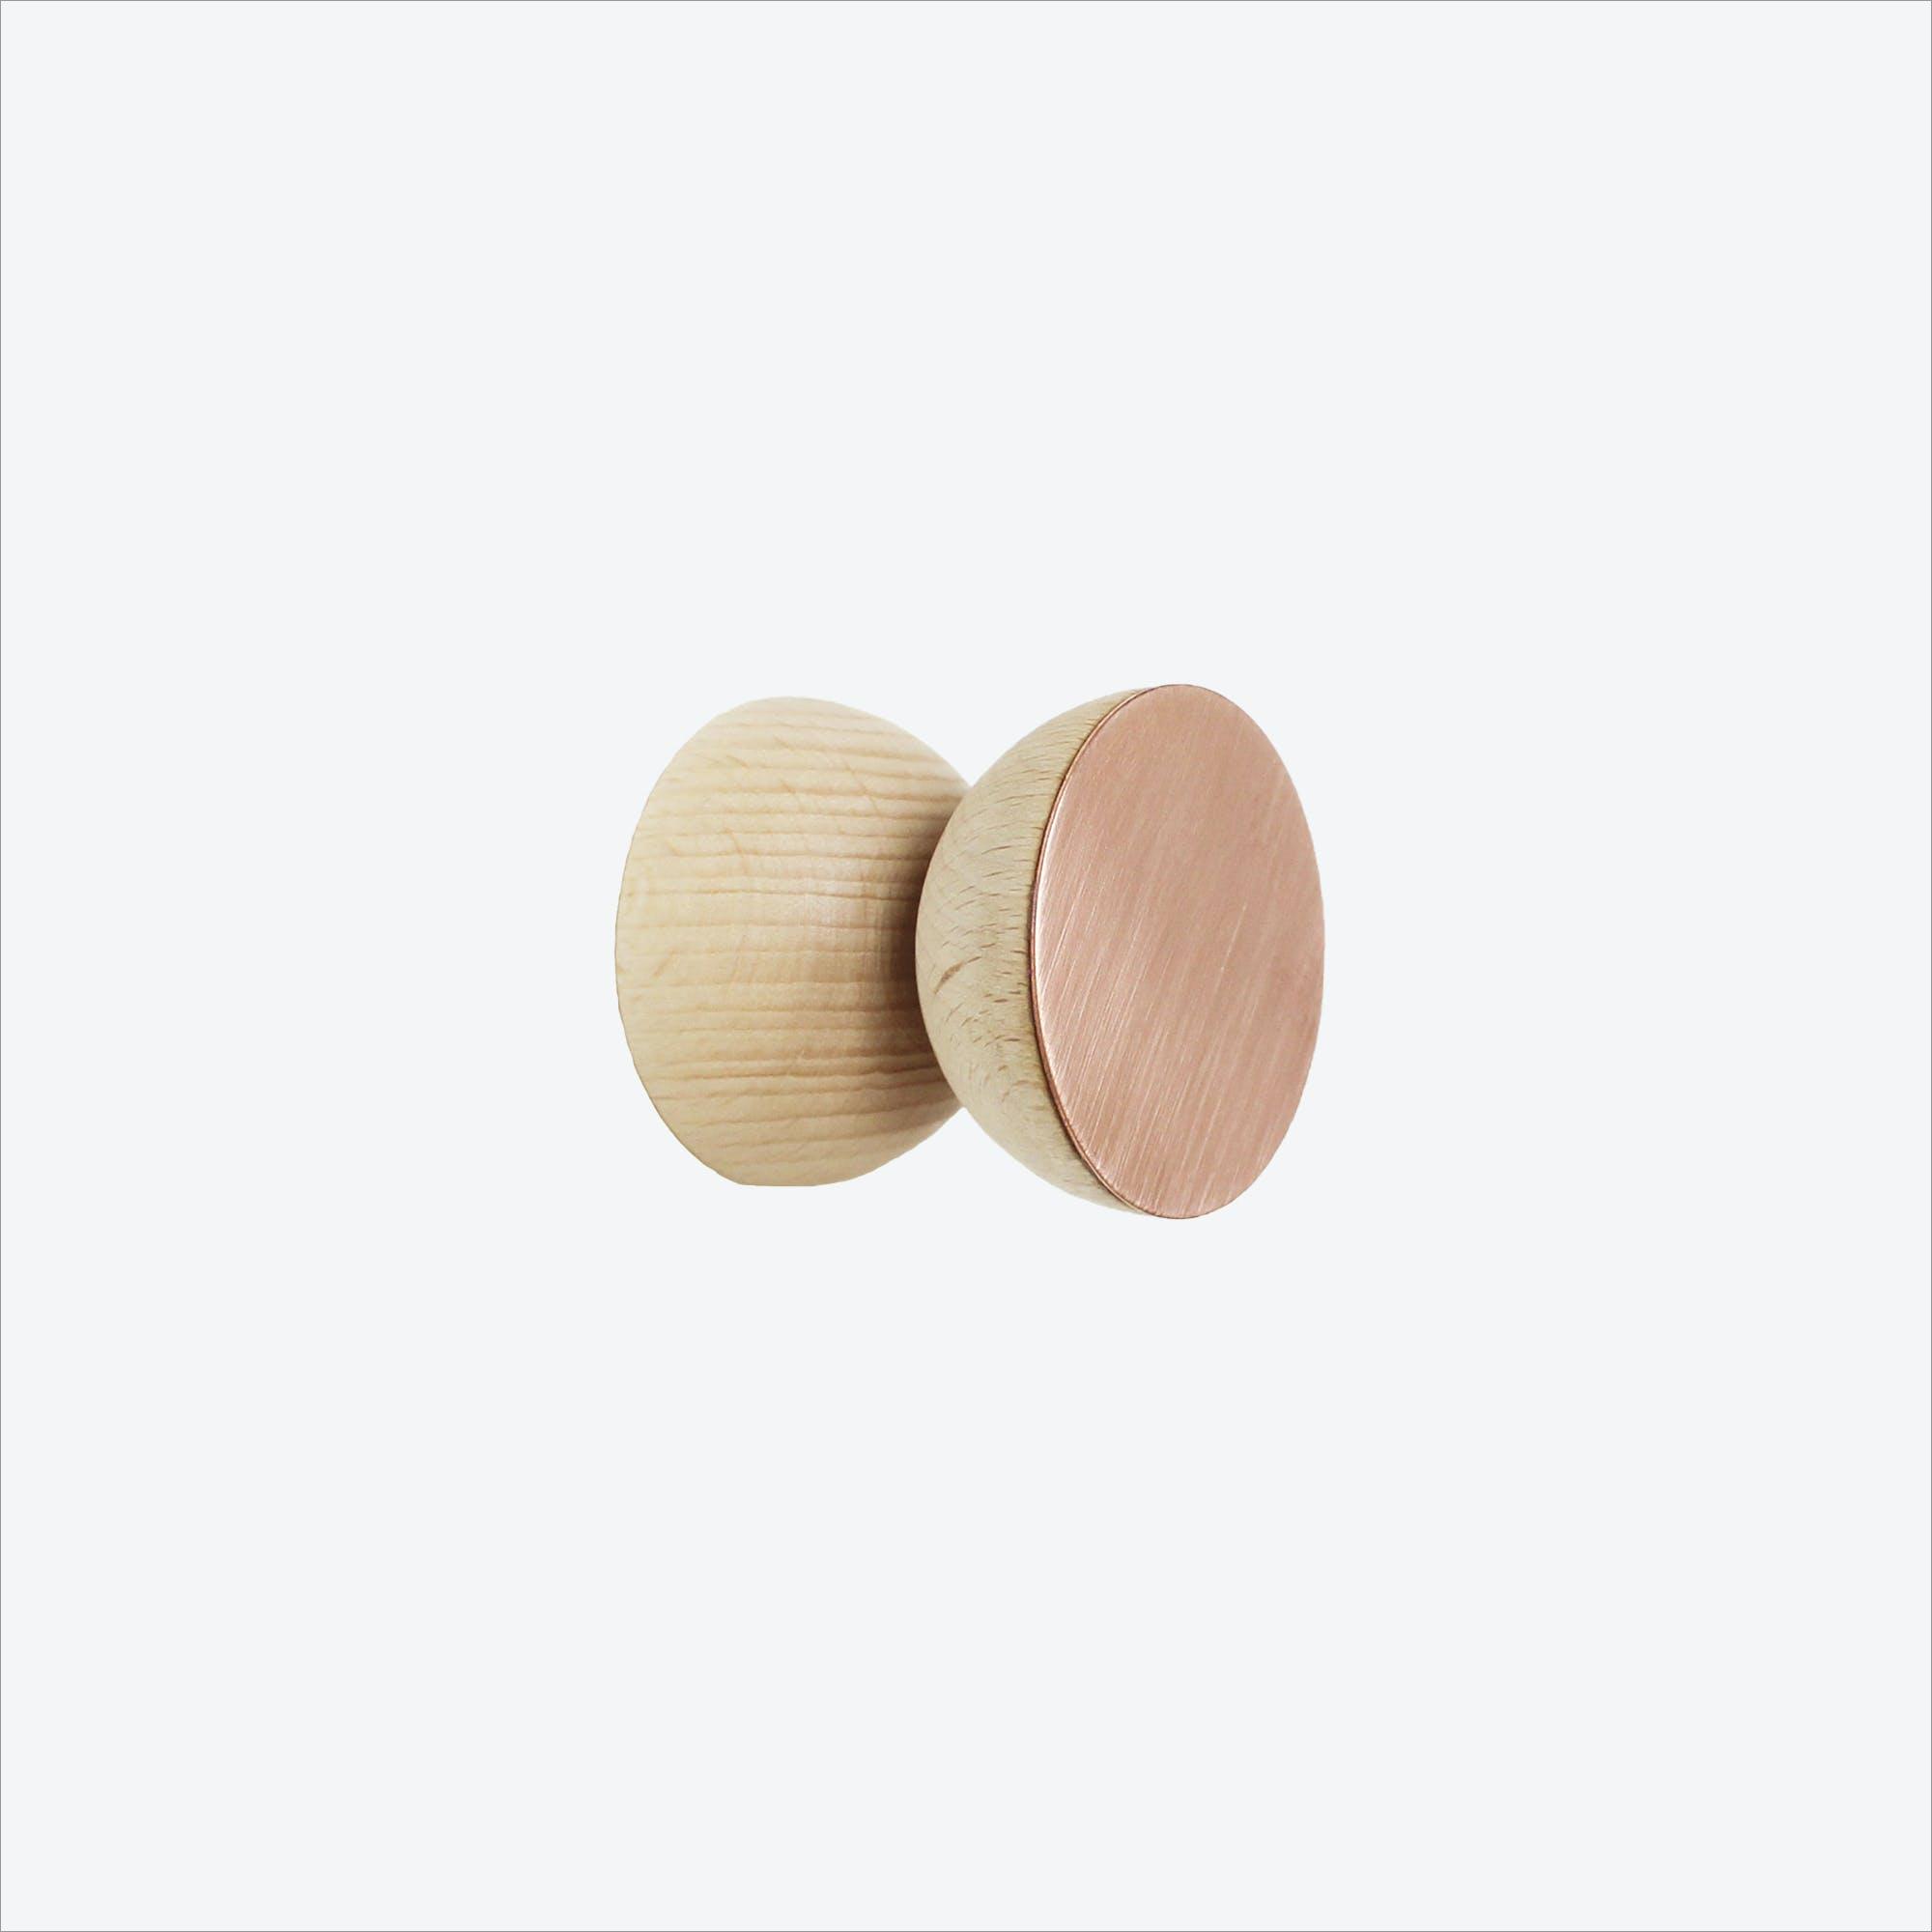 Double Round Beech Wood & Copper Wall Hook, Ø 5cm